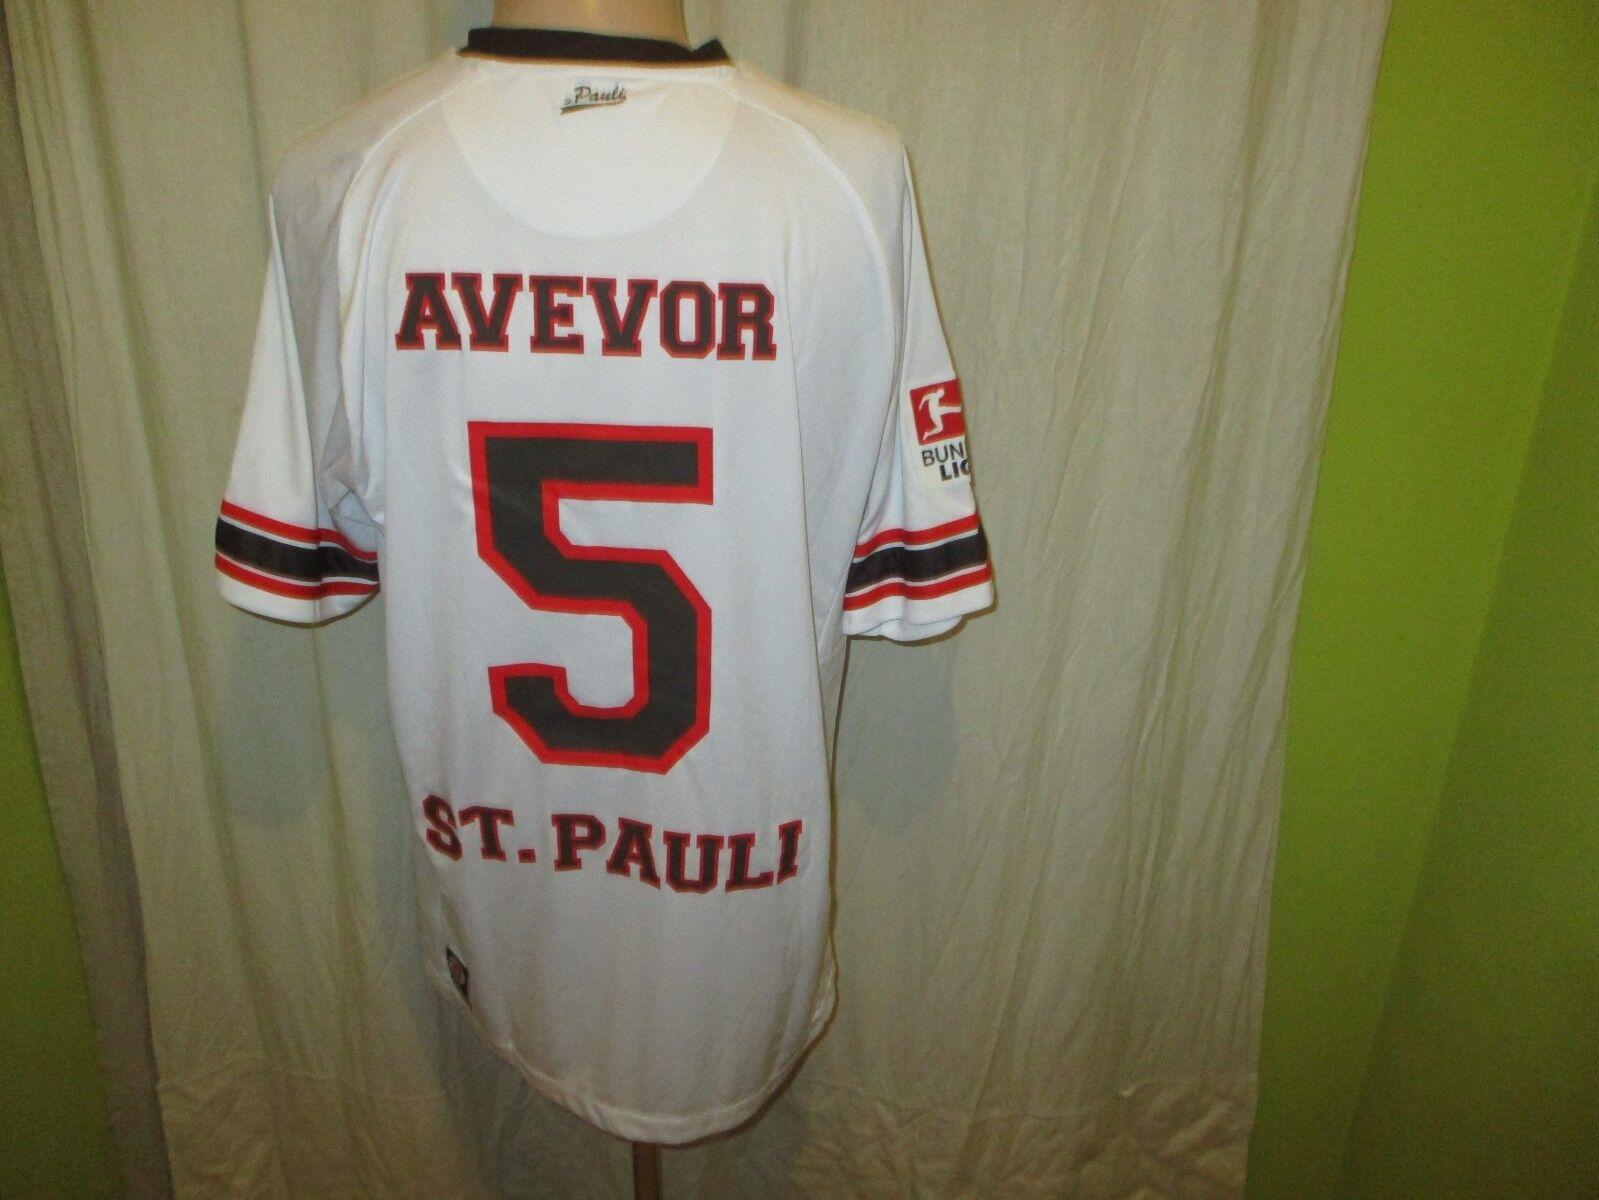 FC St.Pauli St.Pauli St.Pauli DoYou Football Auswärts Trikot 2012 13 + Nr.5 Avevo Gr.XL TOP c42780